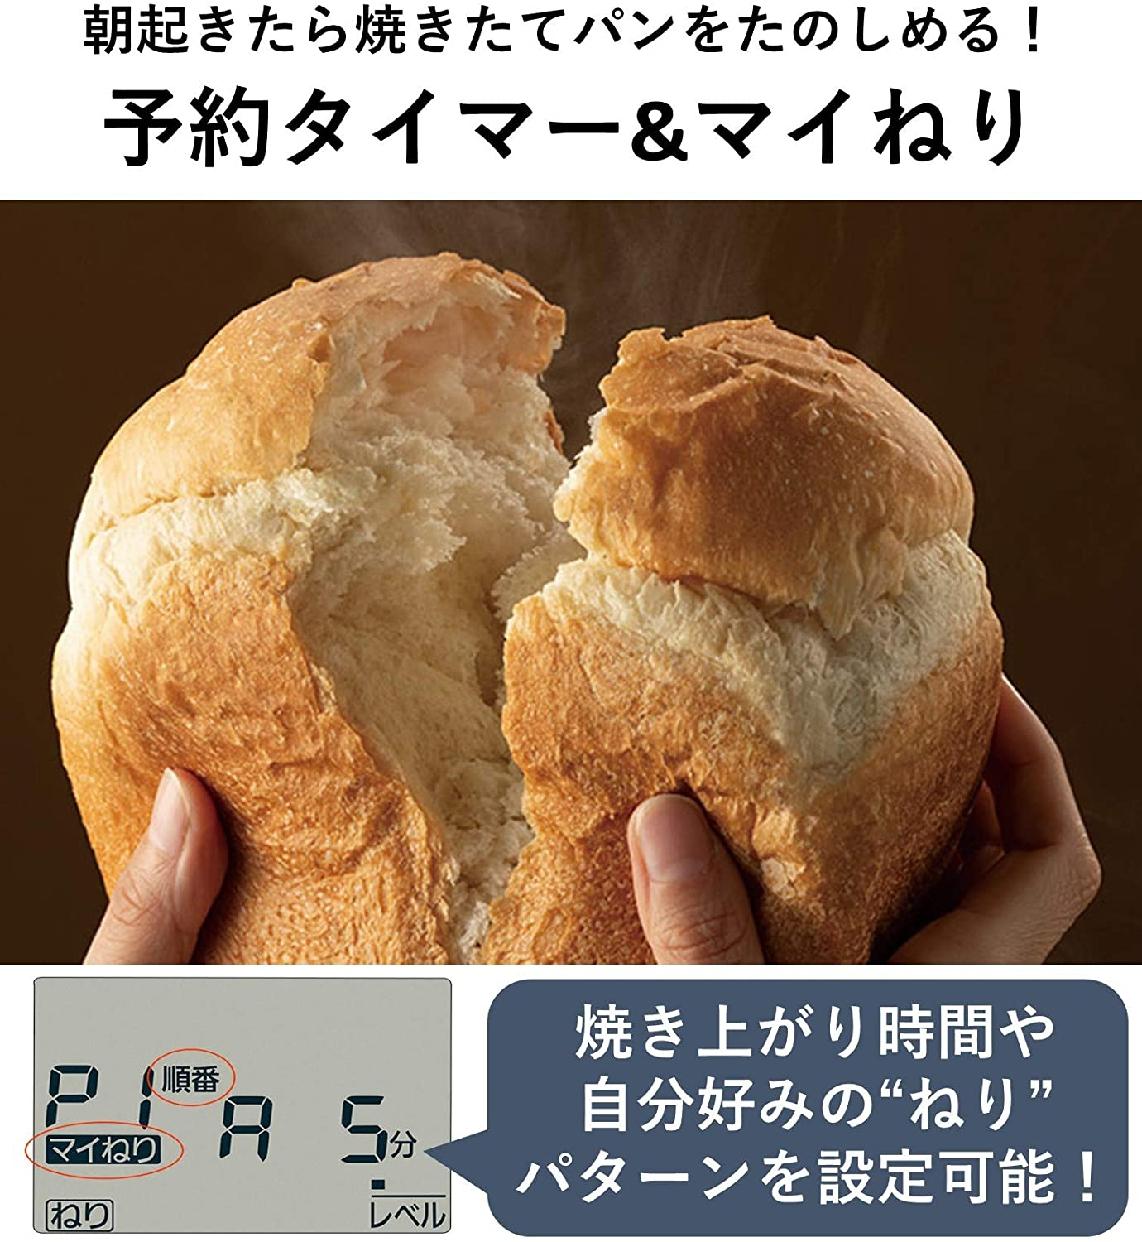 Panasonic(パナソニック)ホームベーカリー SD-MDX102の商品画像7